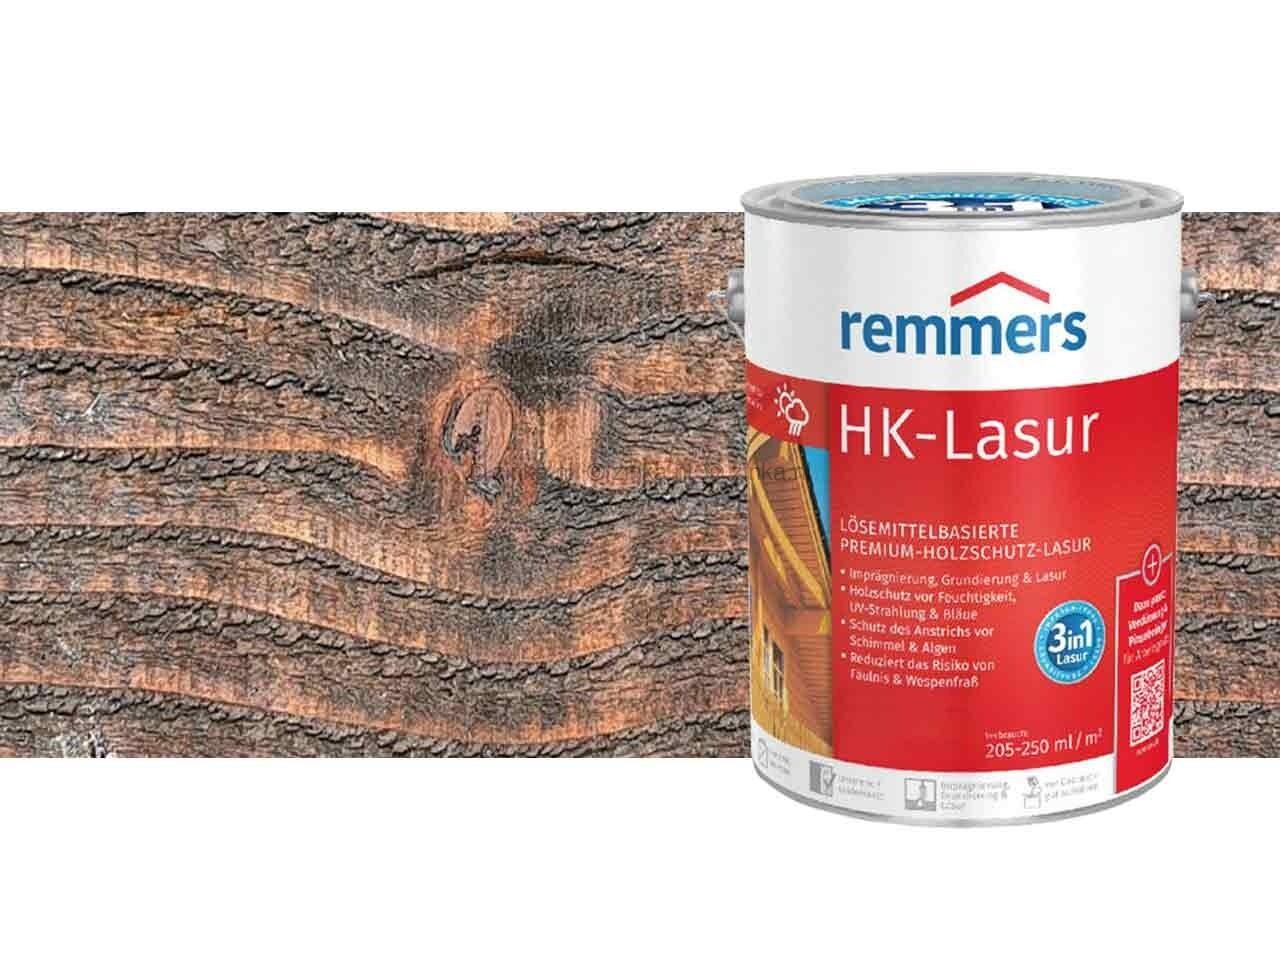 HK-Lazuur palissander 100 ml proefverpakking